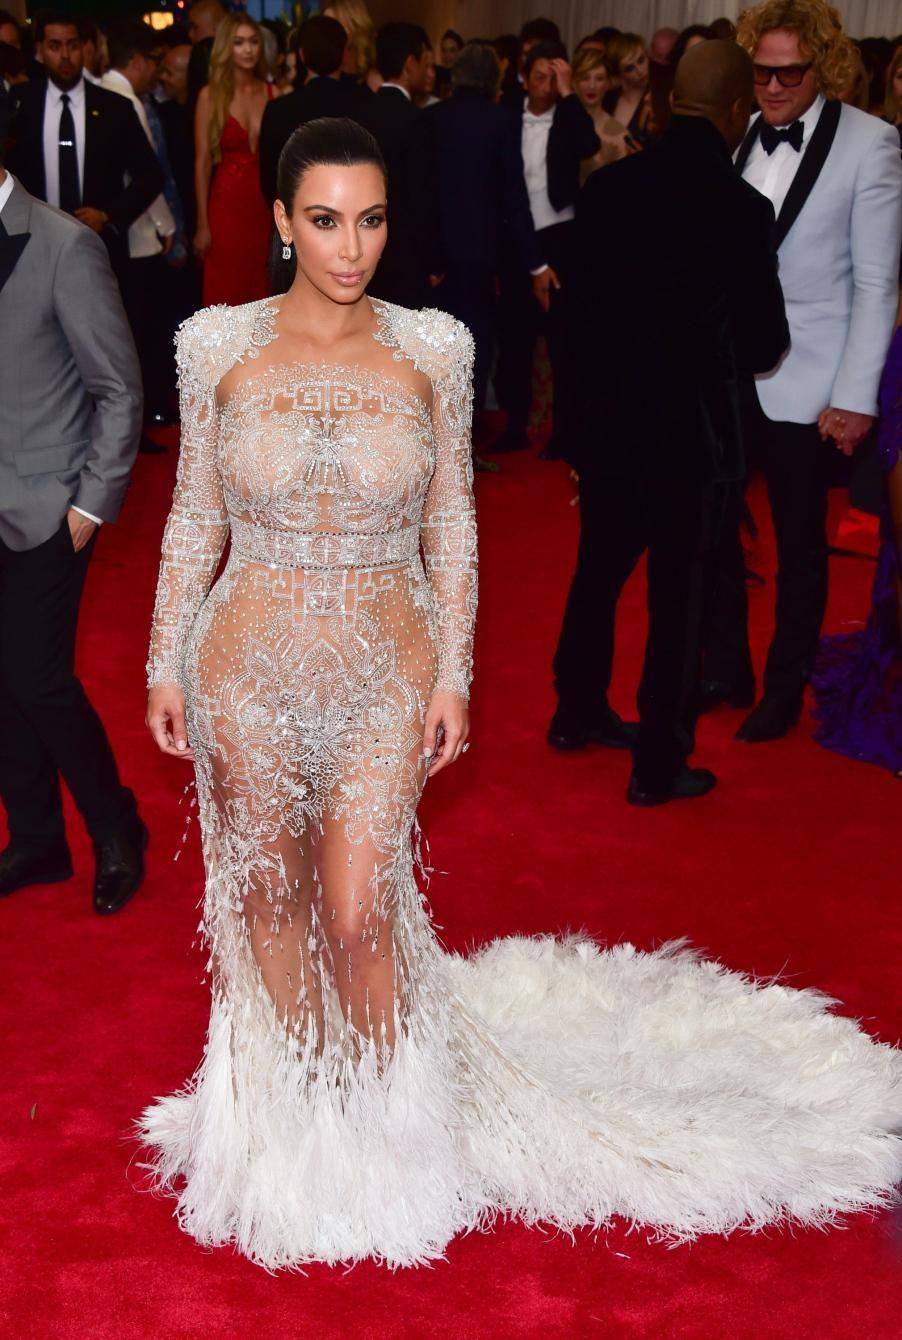 Kim Kardashian Navy Blue Red Carpet Dress FiFi UK ...  |Kim Kardashian Red Carpet Dresses